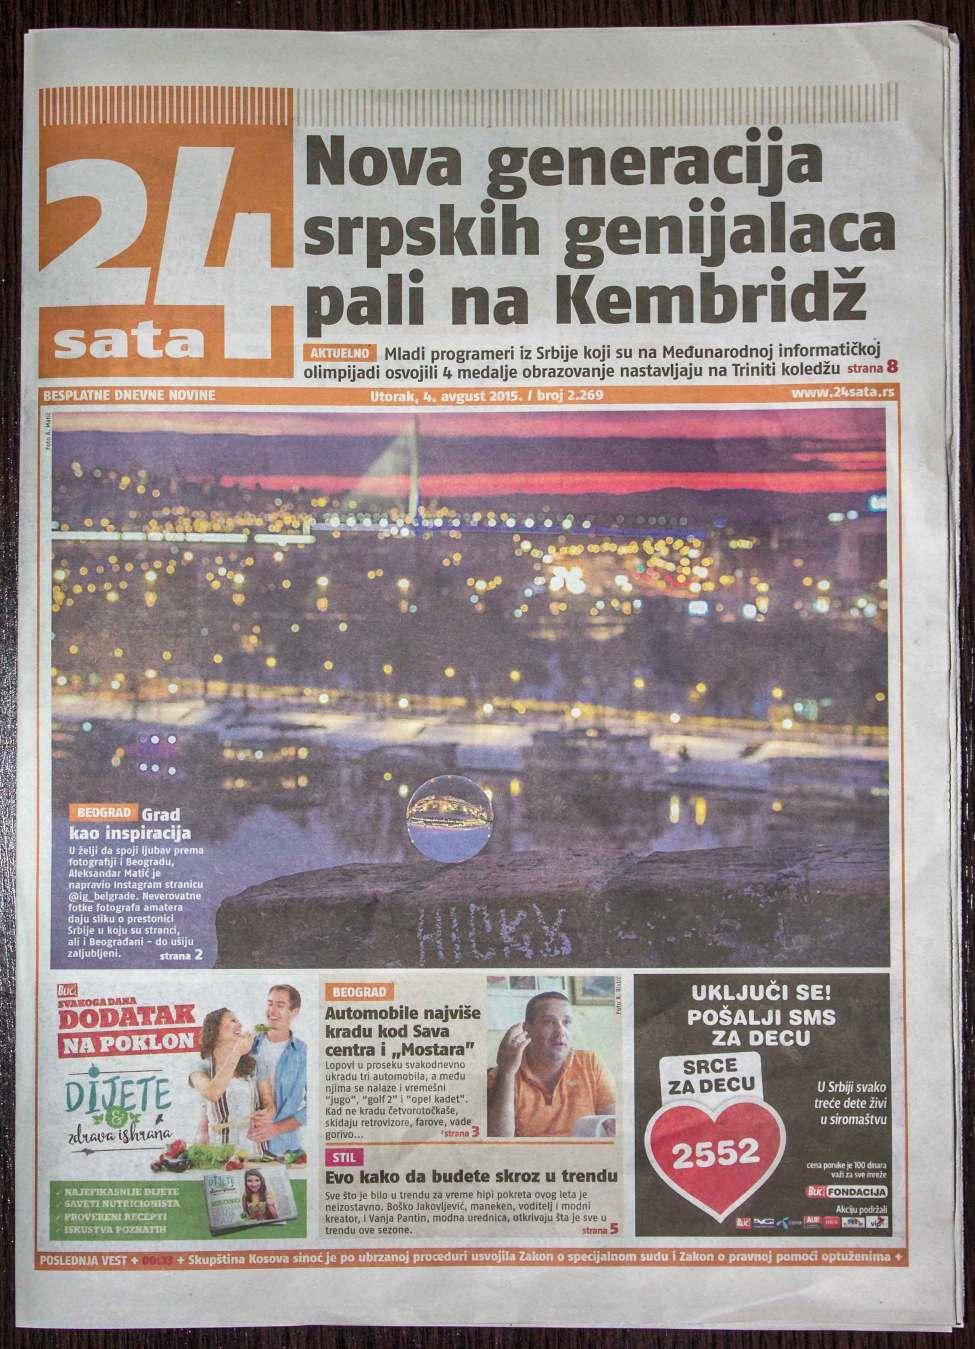 Naslovna strana 24 sata